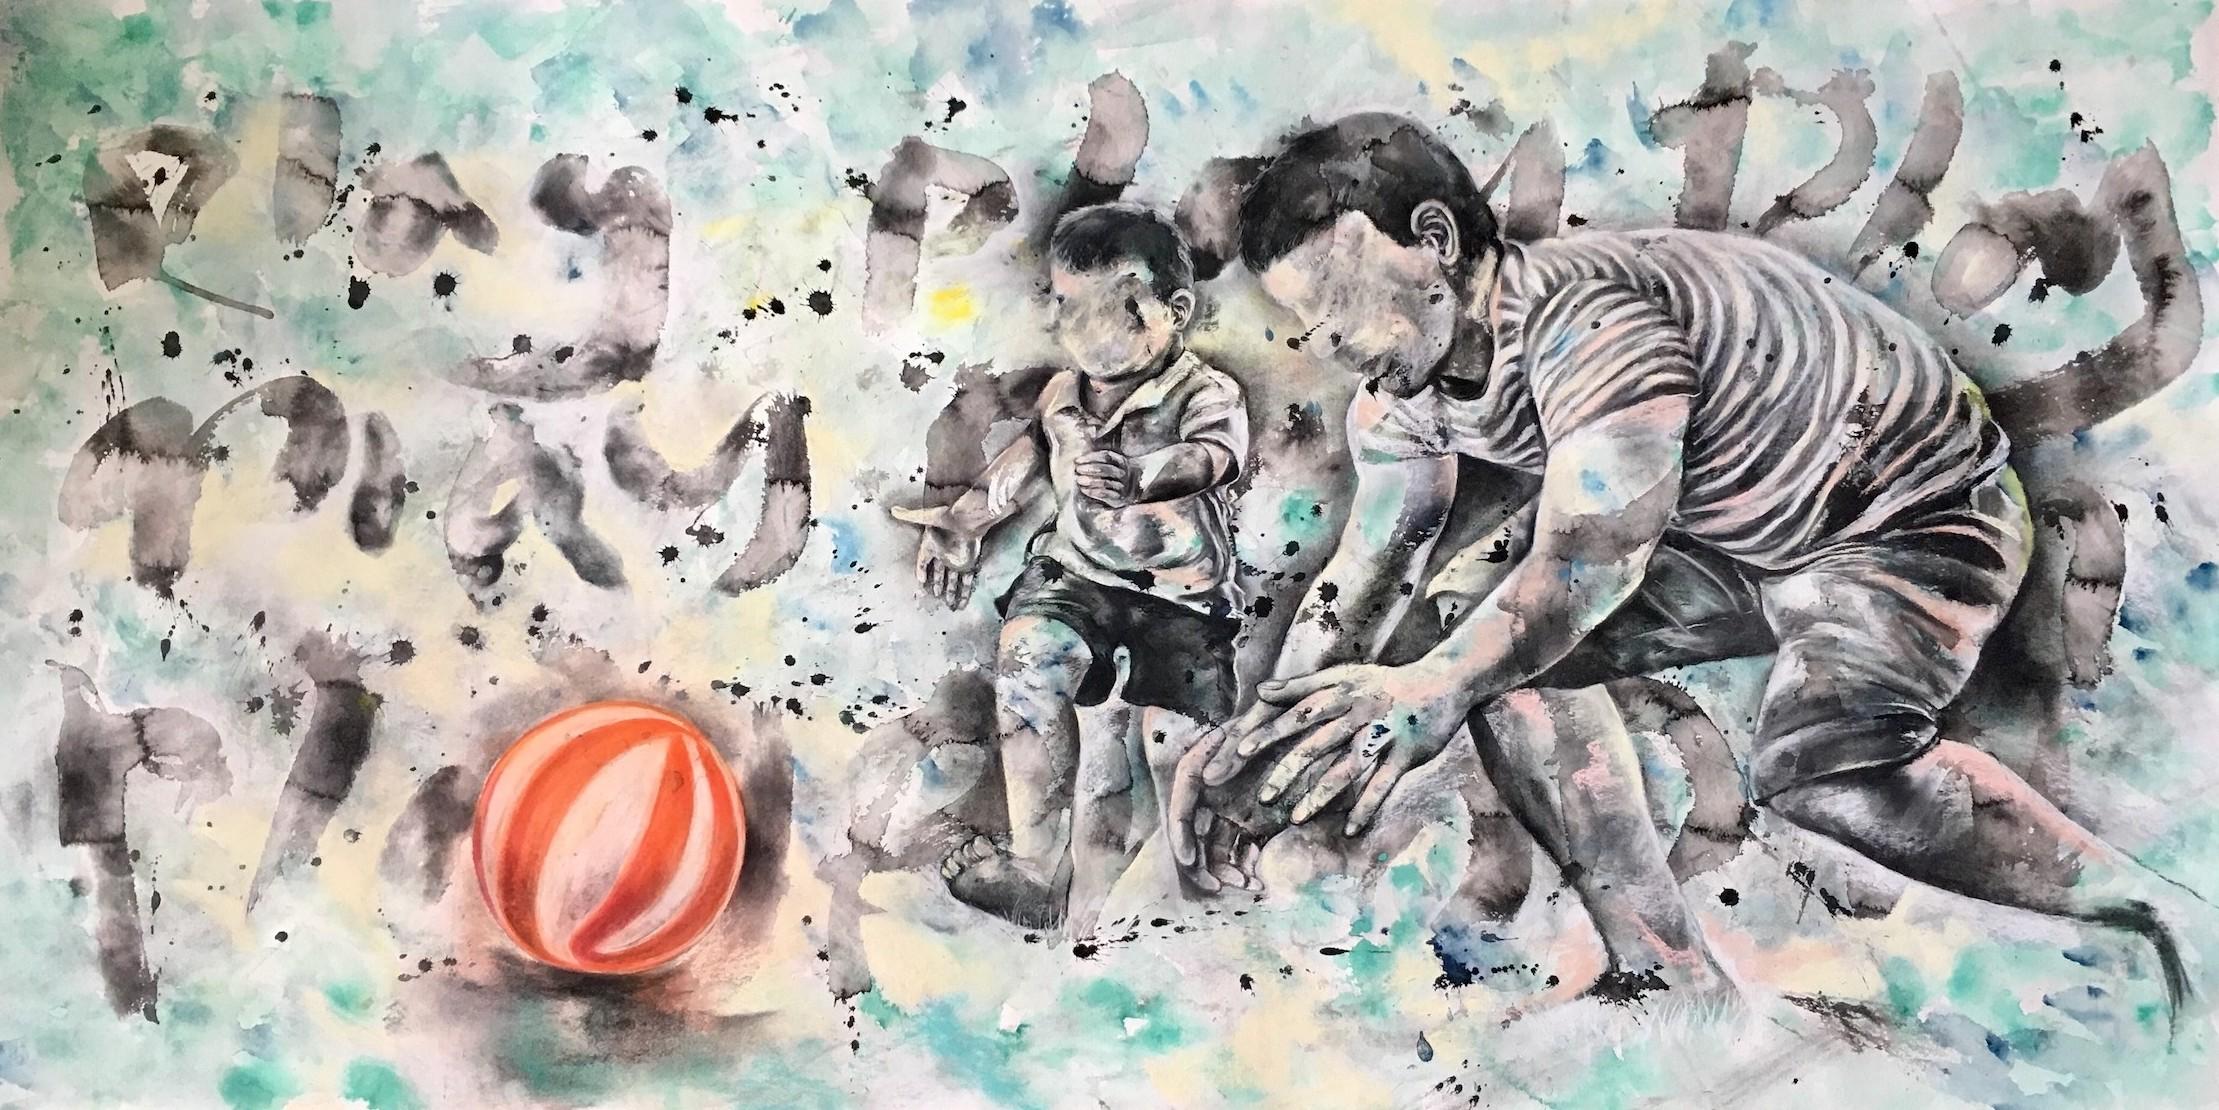 lai-ue Zoe Liu, Play Play Play (Let 'Em Play Series), 2018, £2880, mixed media, original, Blink Gallery